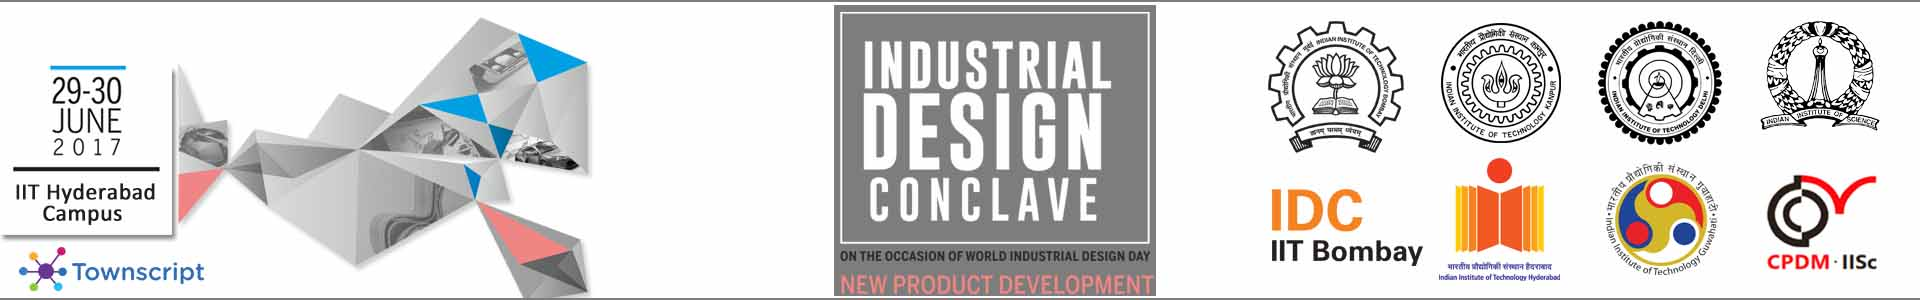 industrial-design-conclave